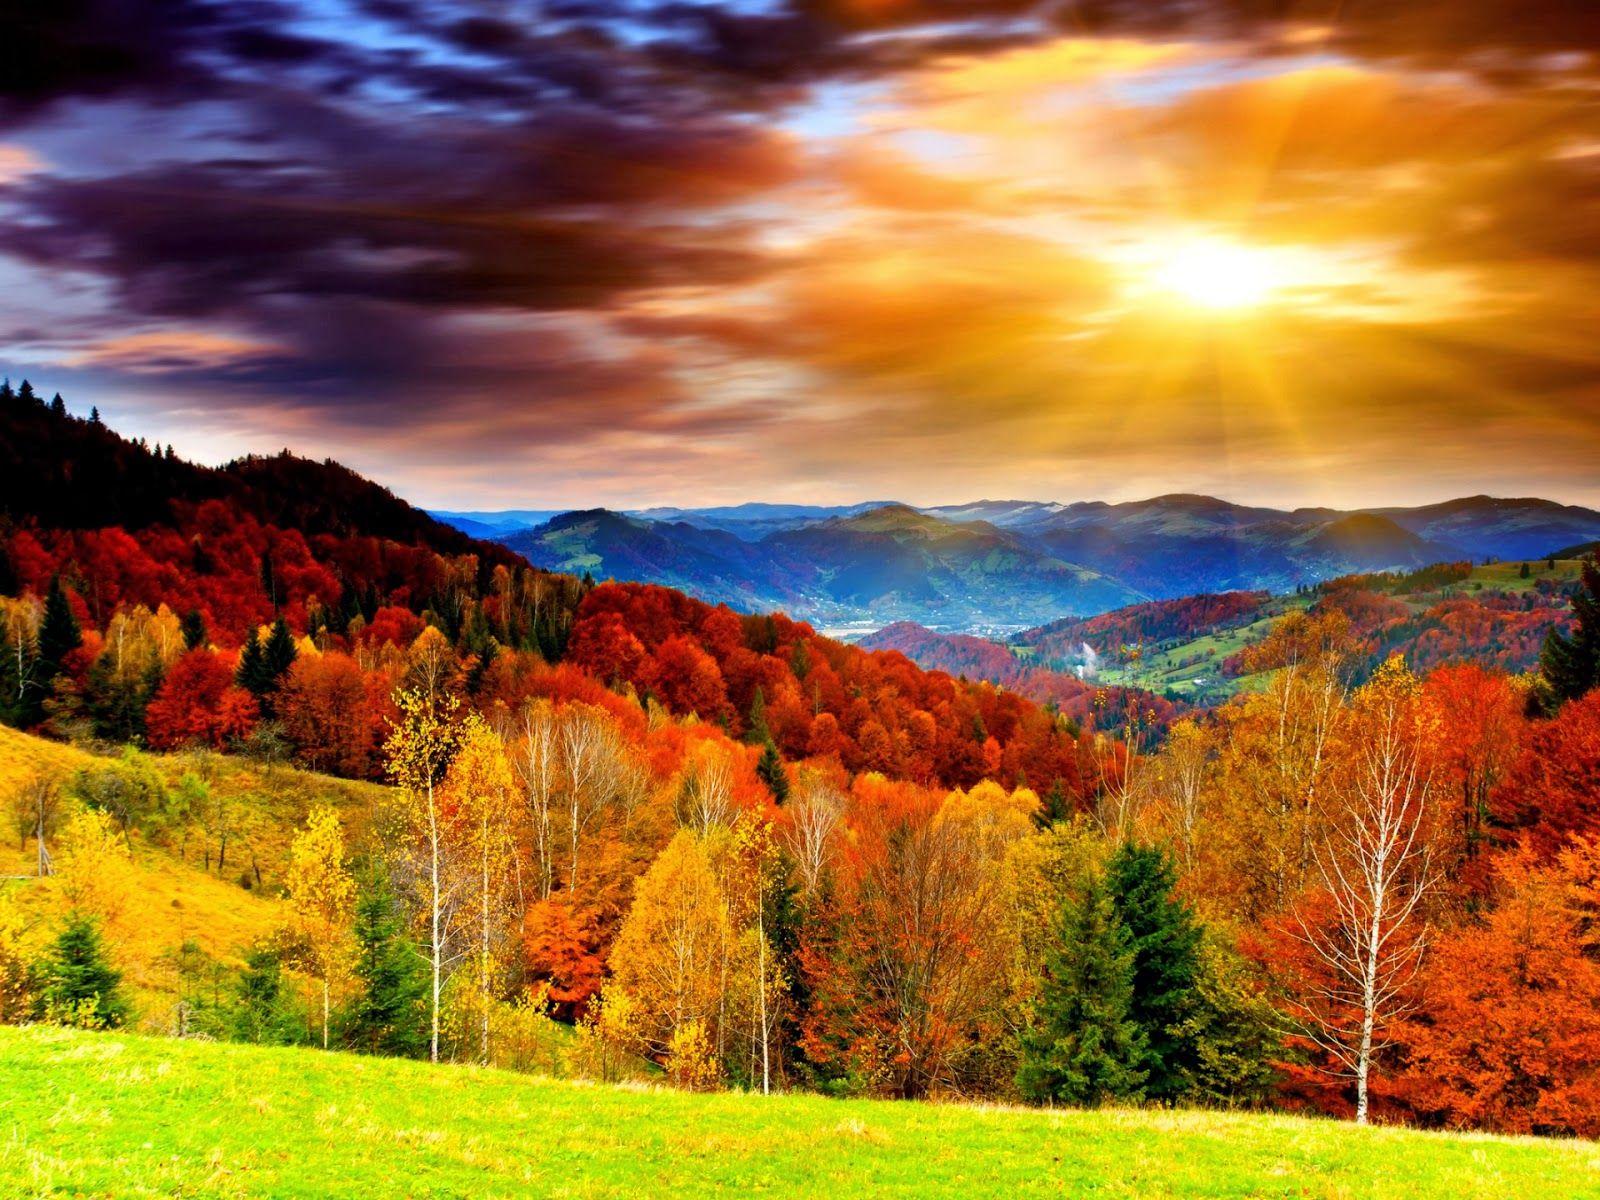 Mega Sale Red Carpet Step And Repeat Backdrops Scenery Wallpaper Beautiful Scenery Wallpaper Autumn Landscape